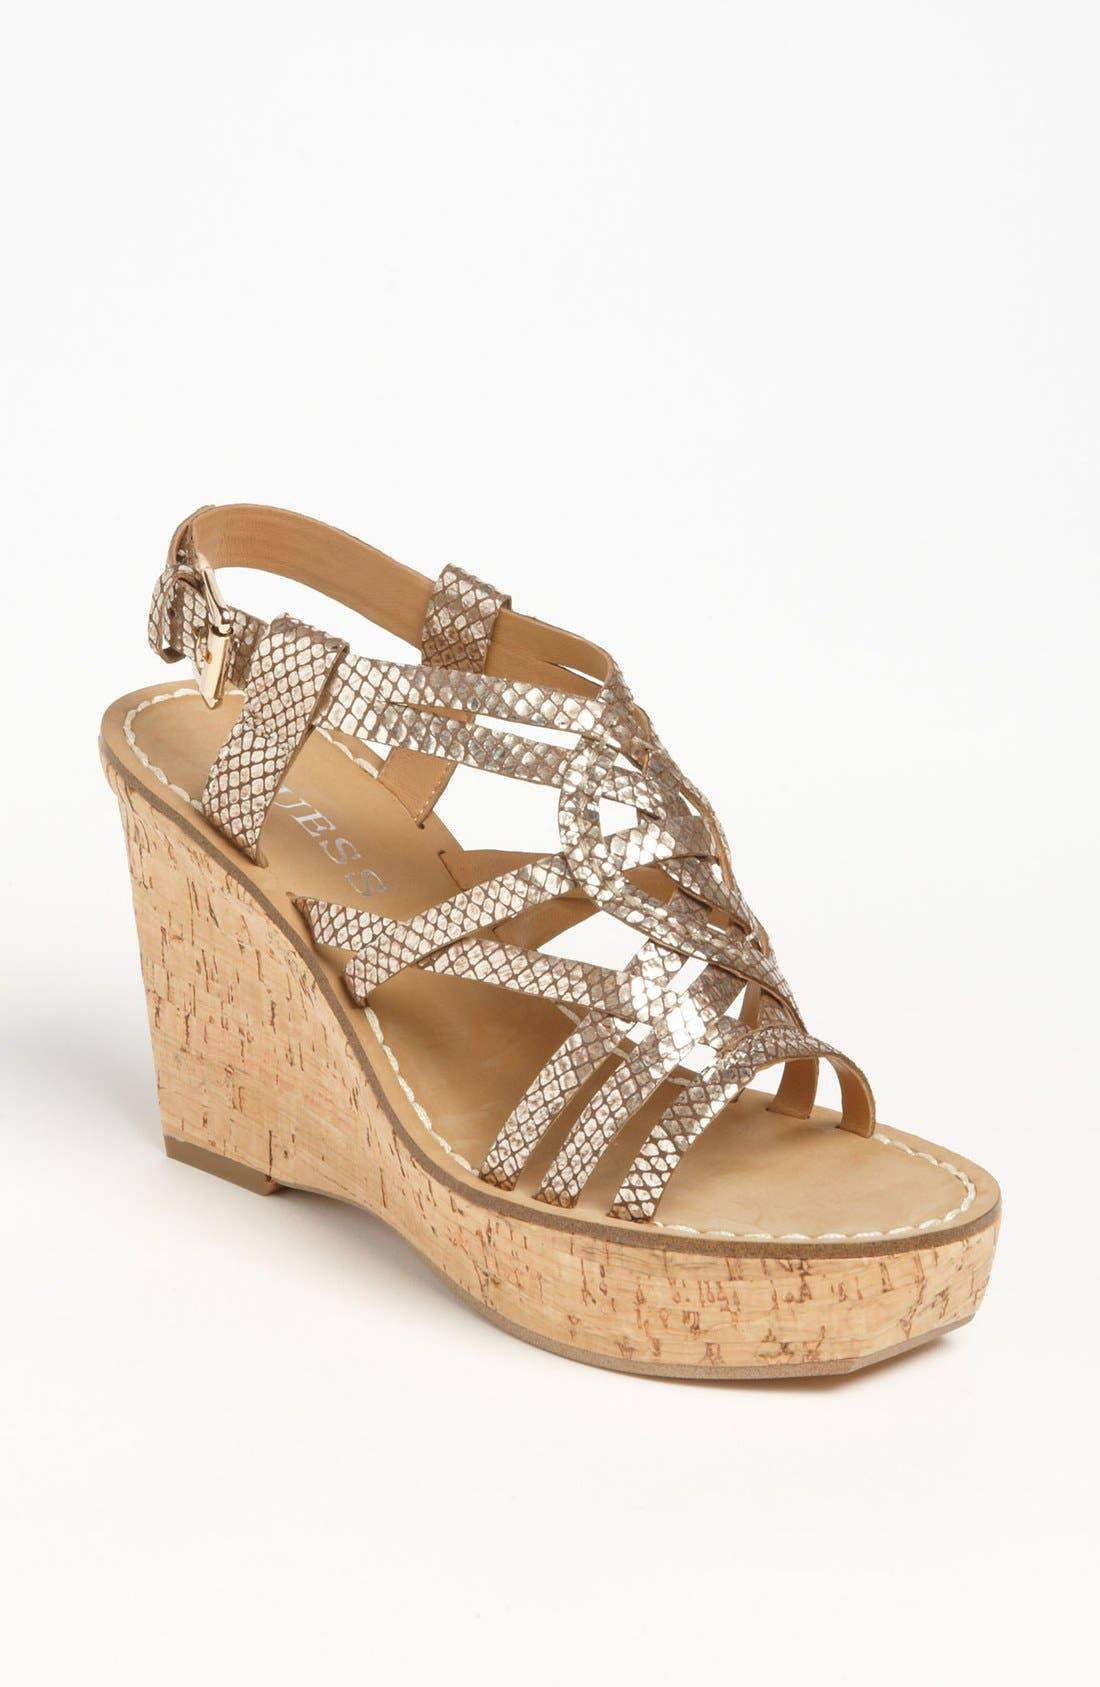 Main Image - GUESS 'Yarkena' Sandal